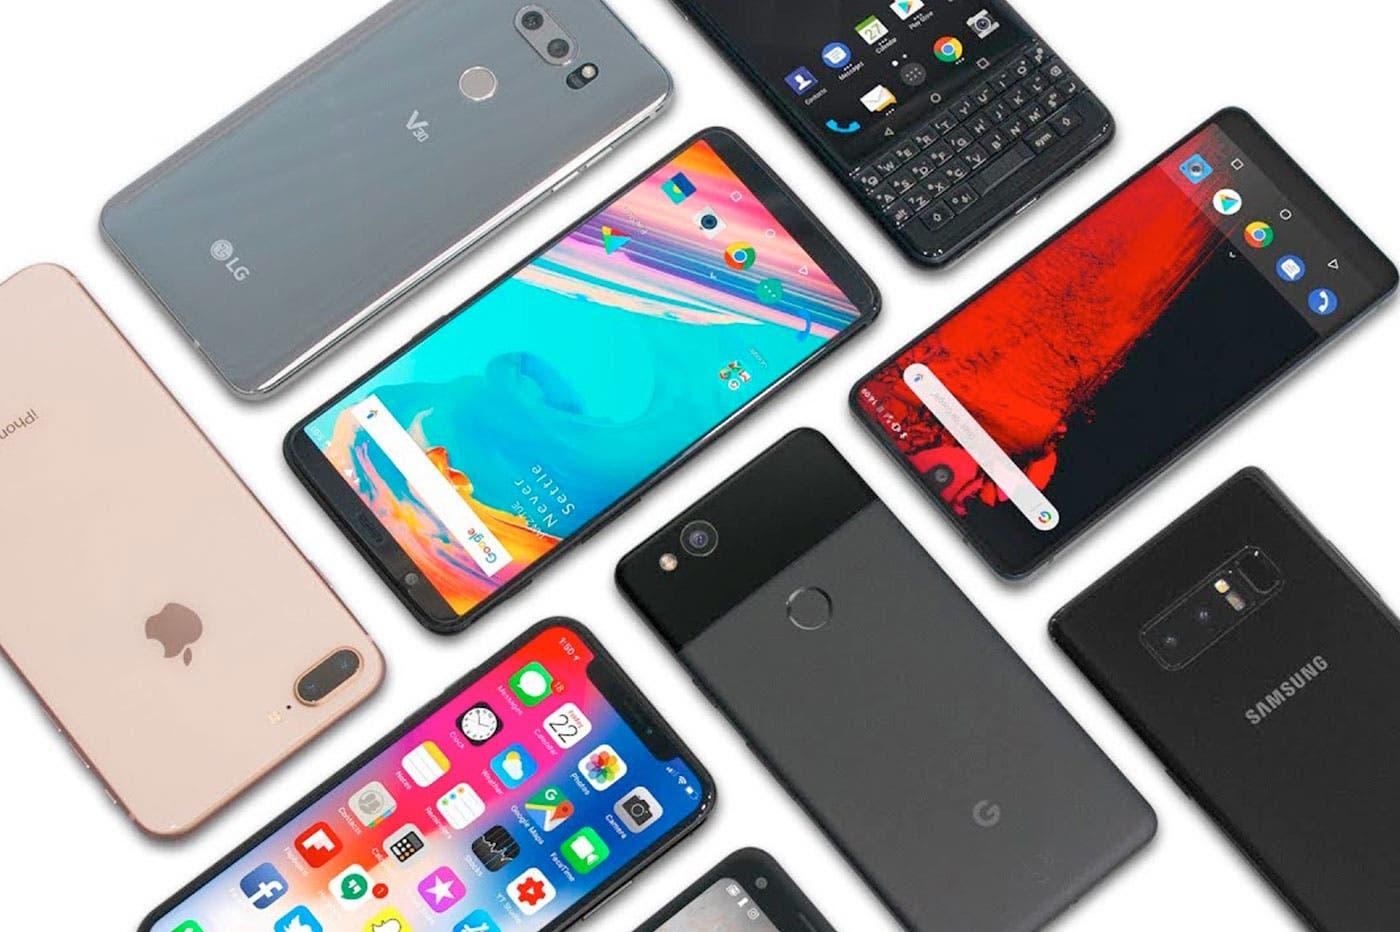 Mid-range smartphone